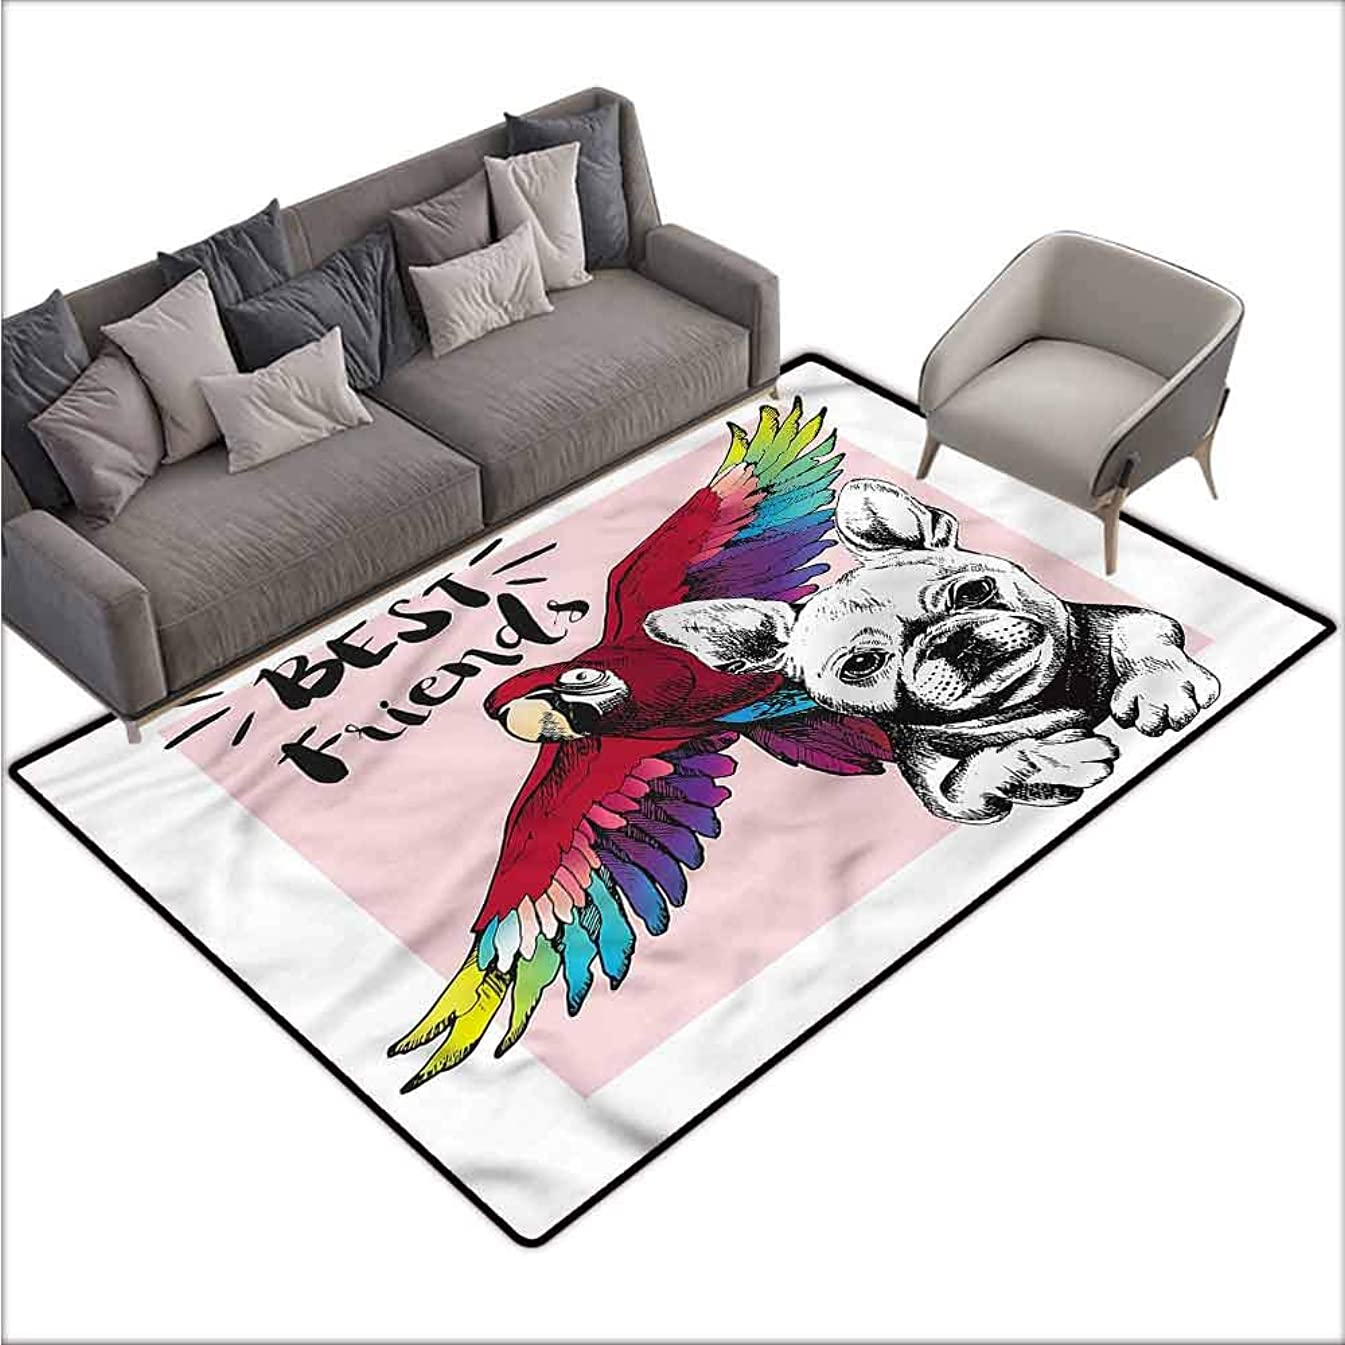 Living Room Bedroom Carpets Modern,Bulldog Parrot Friends 36